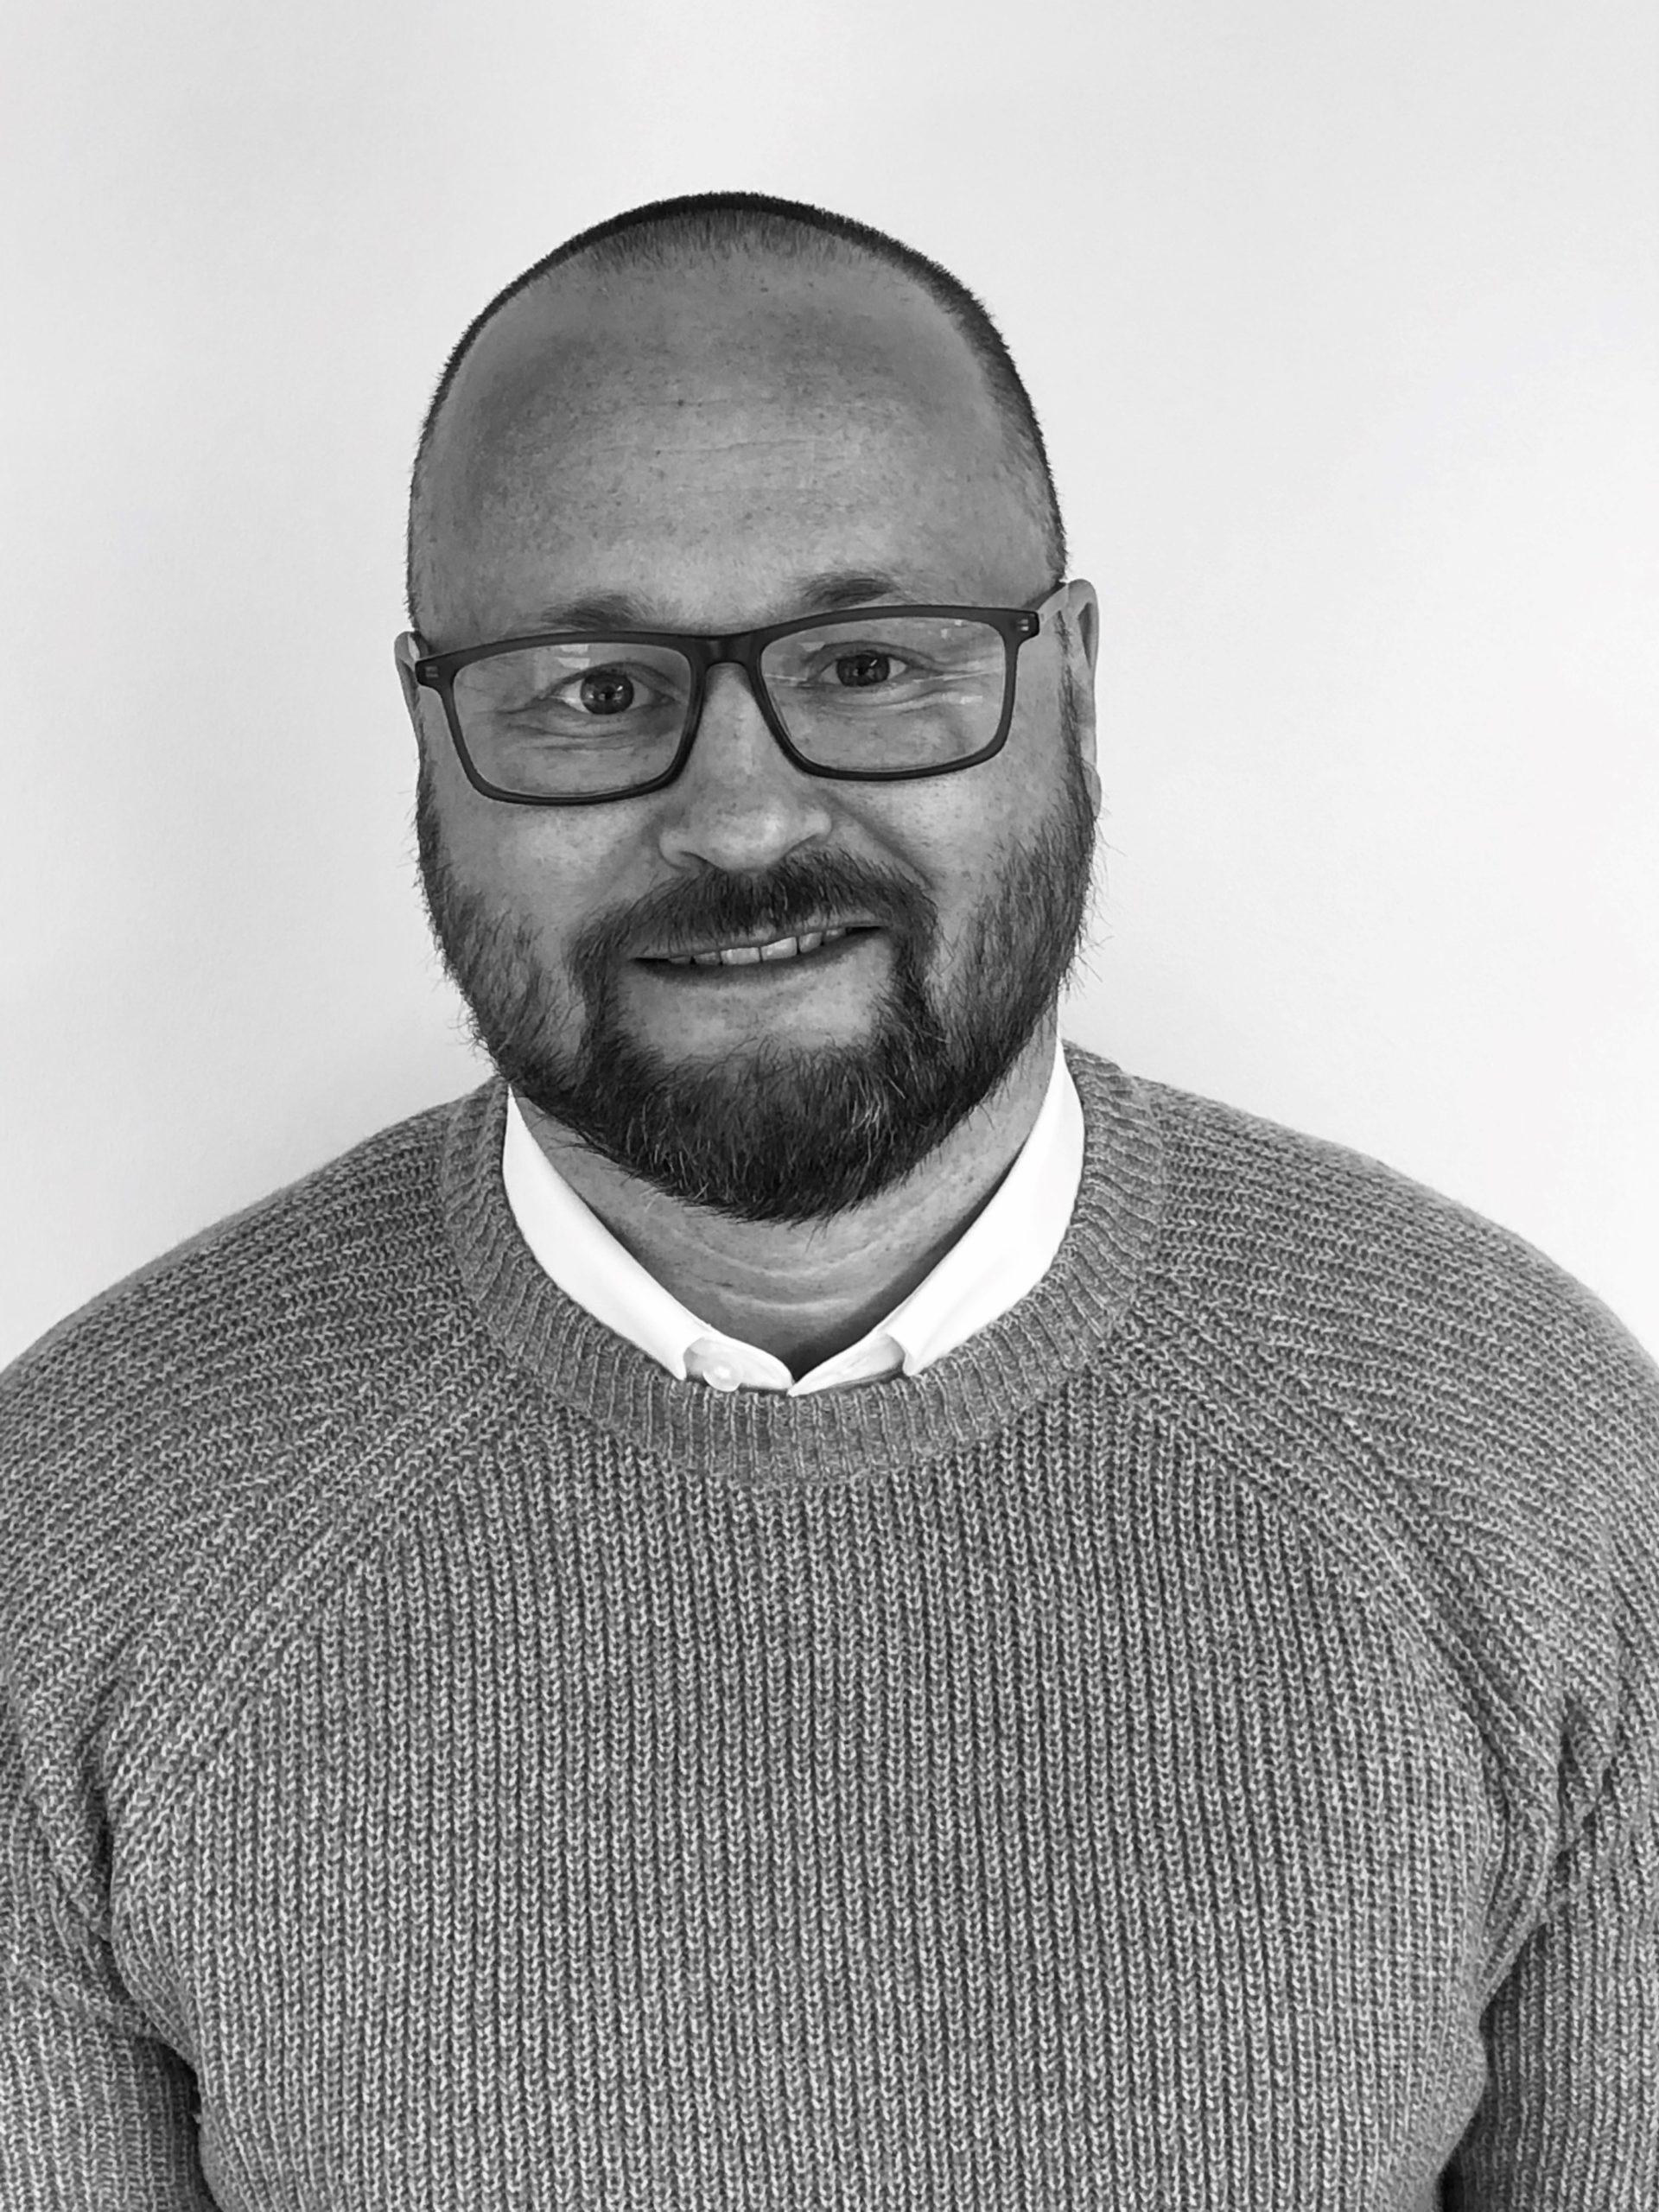 Gareth Staines